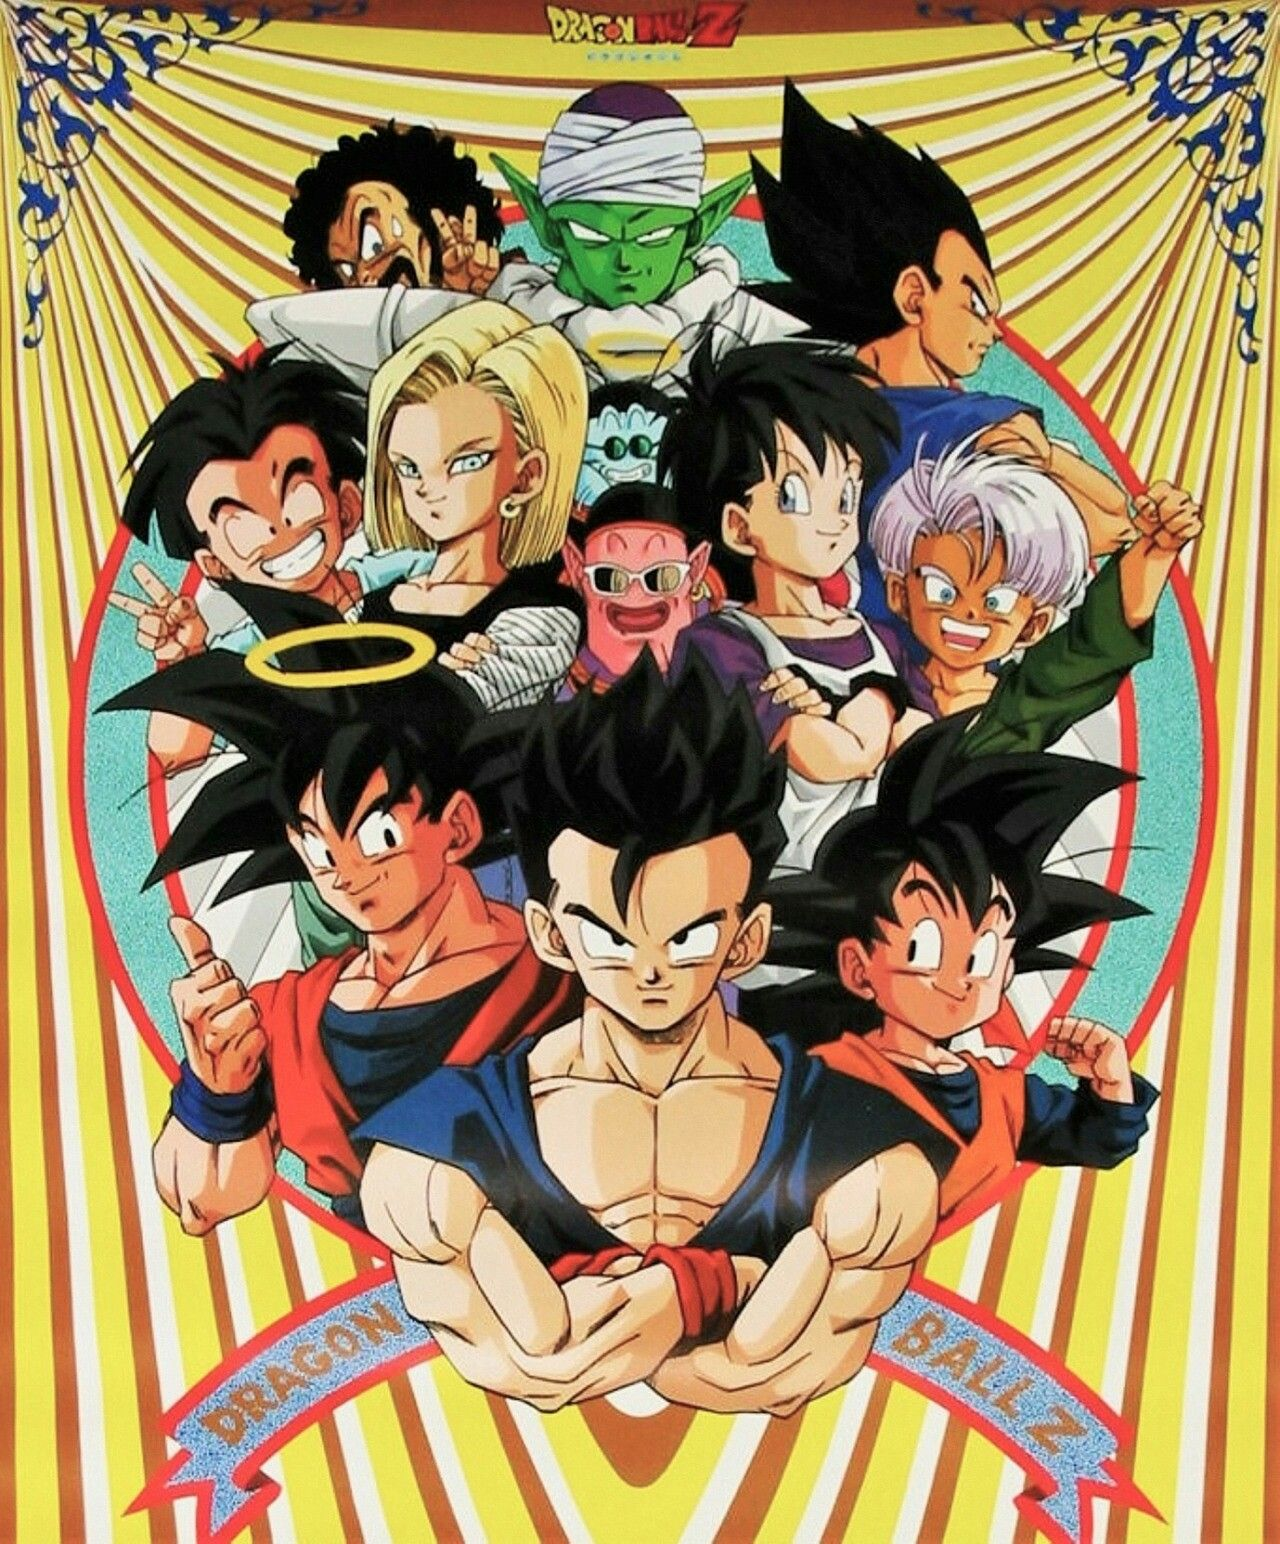 Gohan Goku Goten Trunks Videl Android 18 Krillin Piccolo Vegeta Hercule King Kai And South Kai